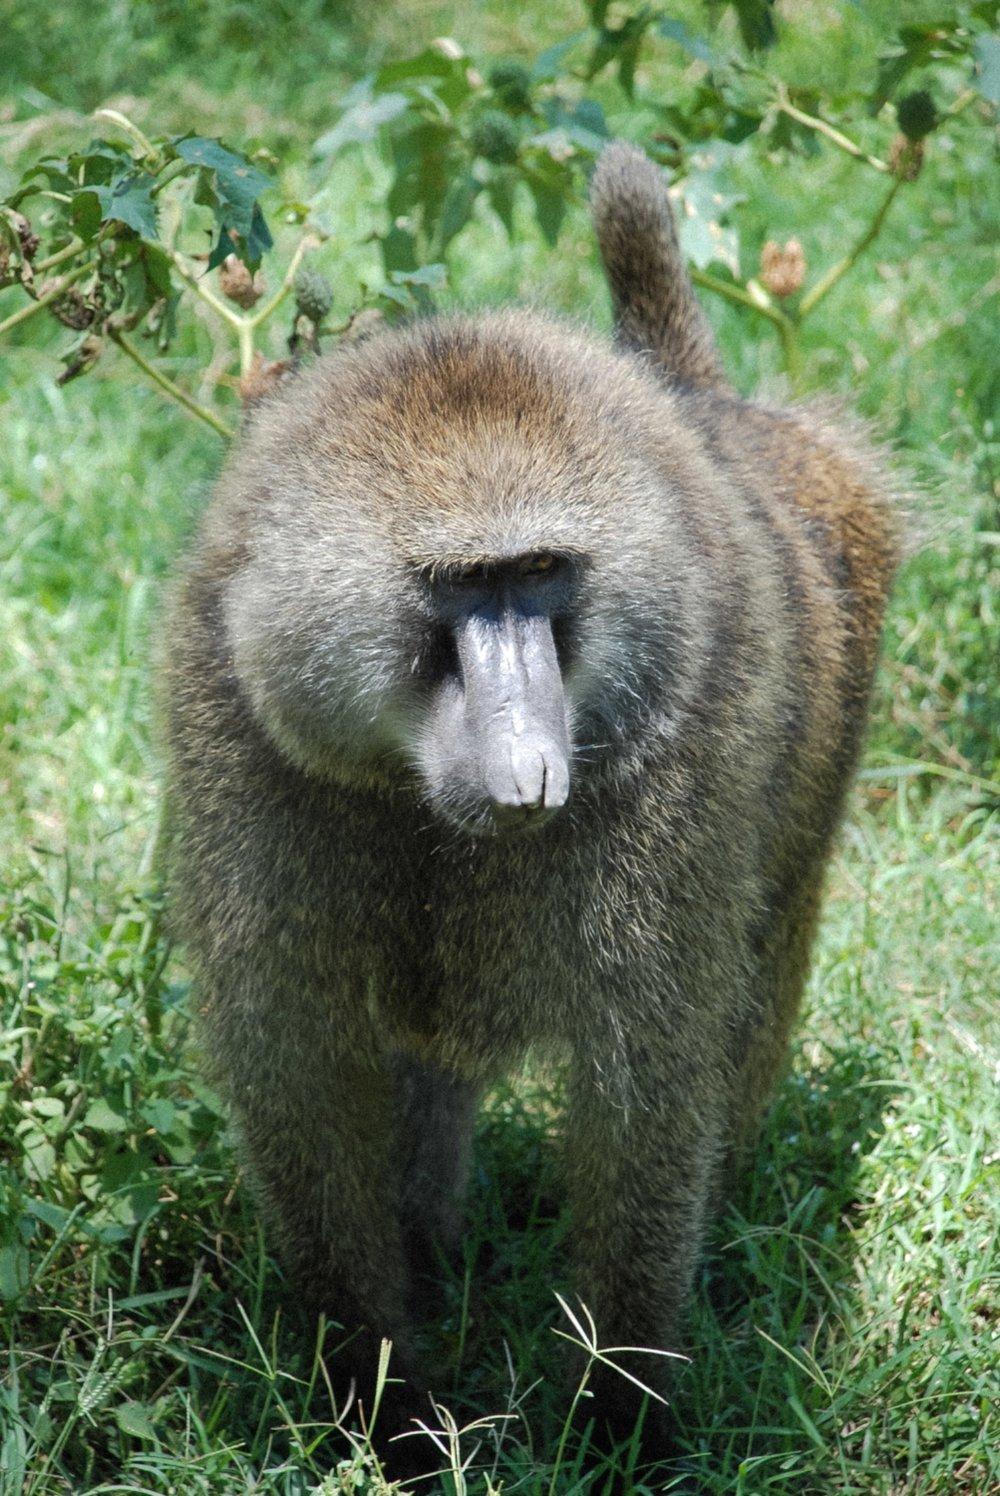 curio.trips.kenya.maasai.mara.monkey.portrait.jpg